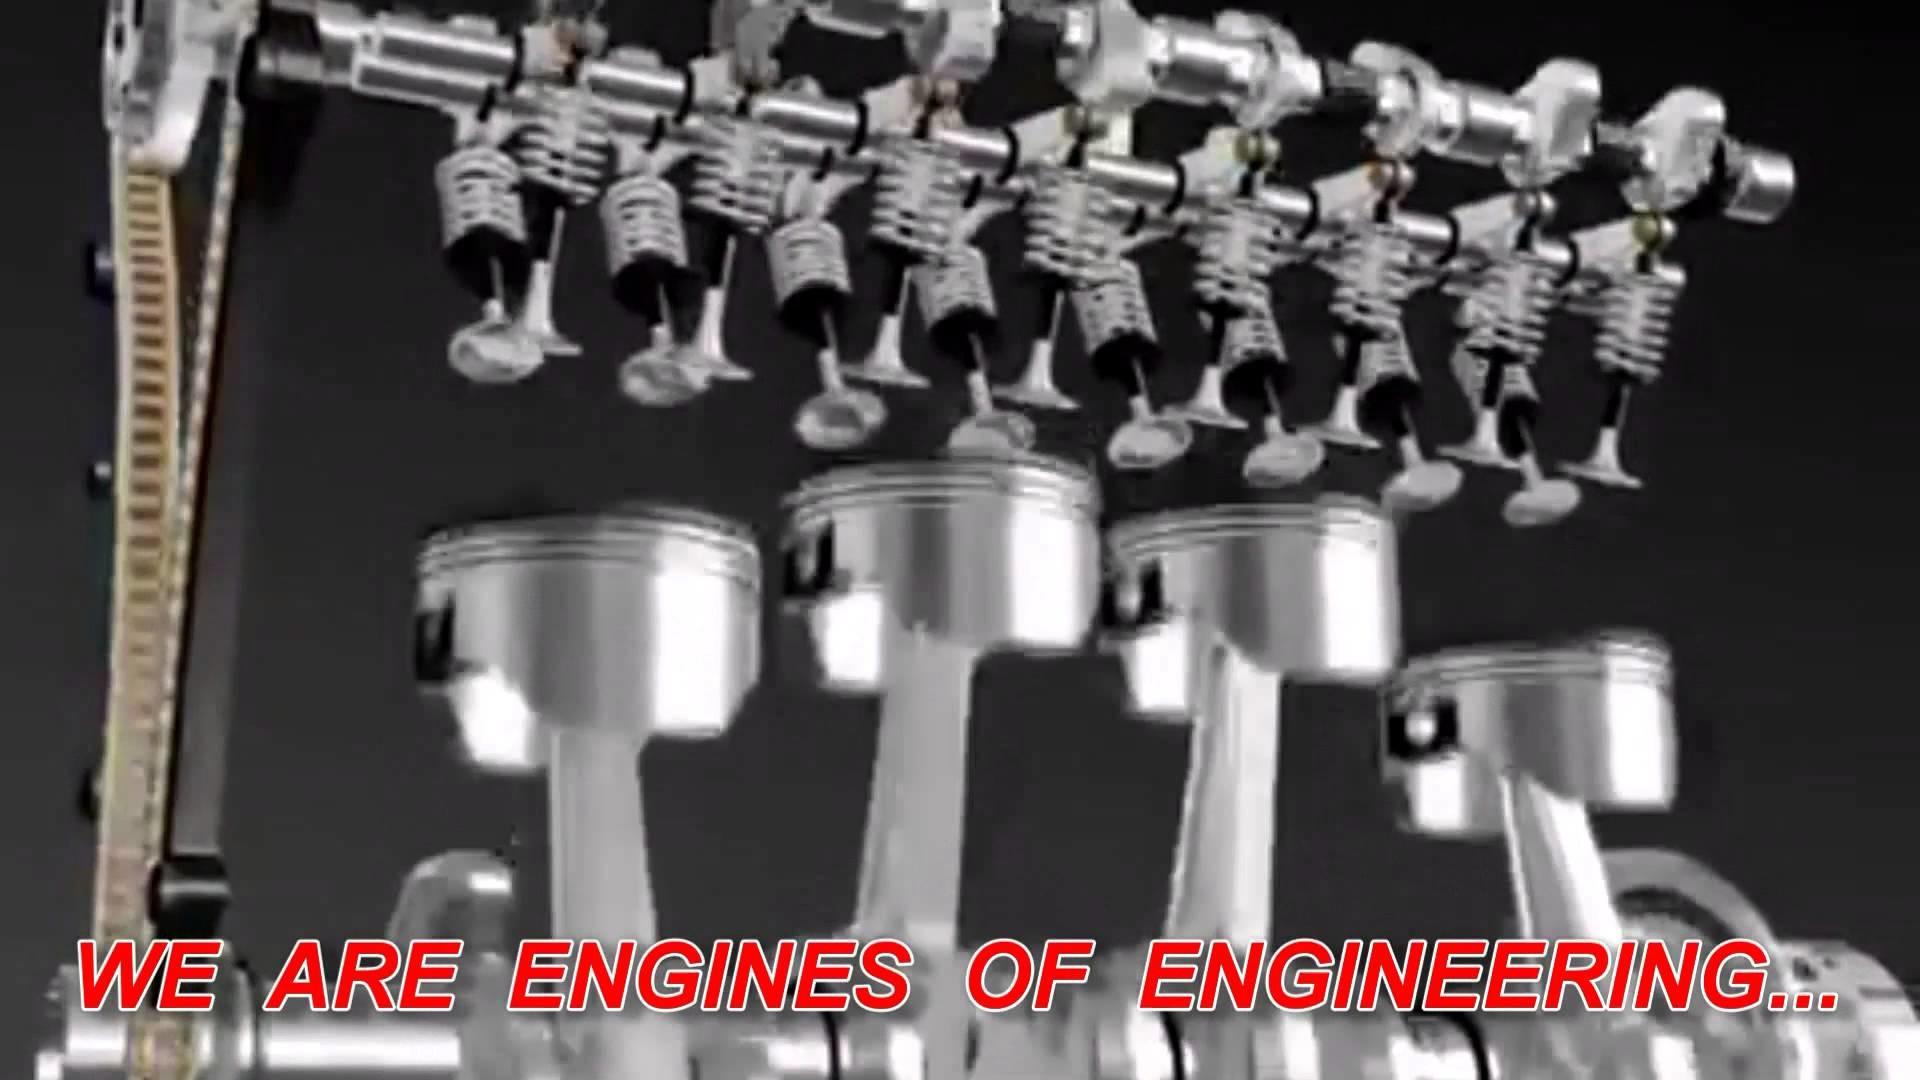 Best Car Logos Wallpaper Mechanical Engineering Wallpaper 63 Images